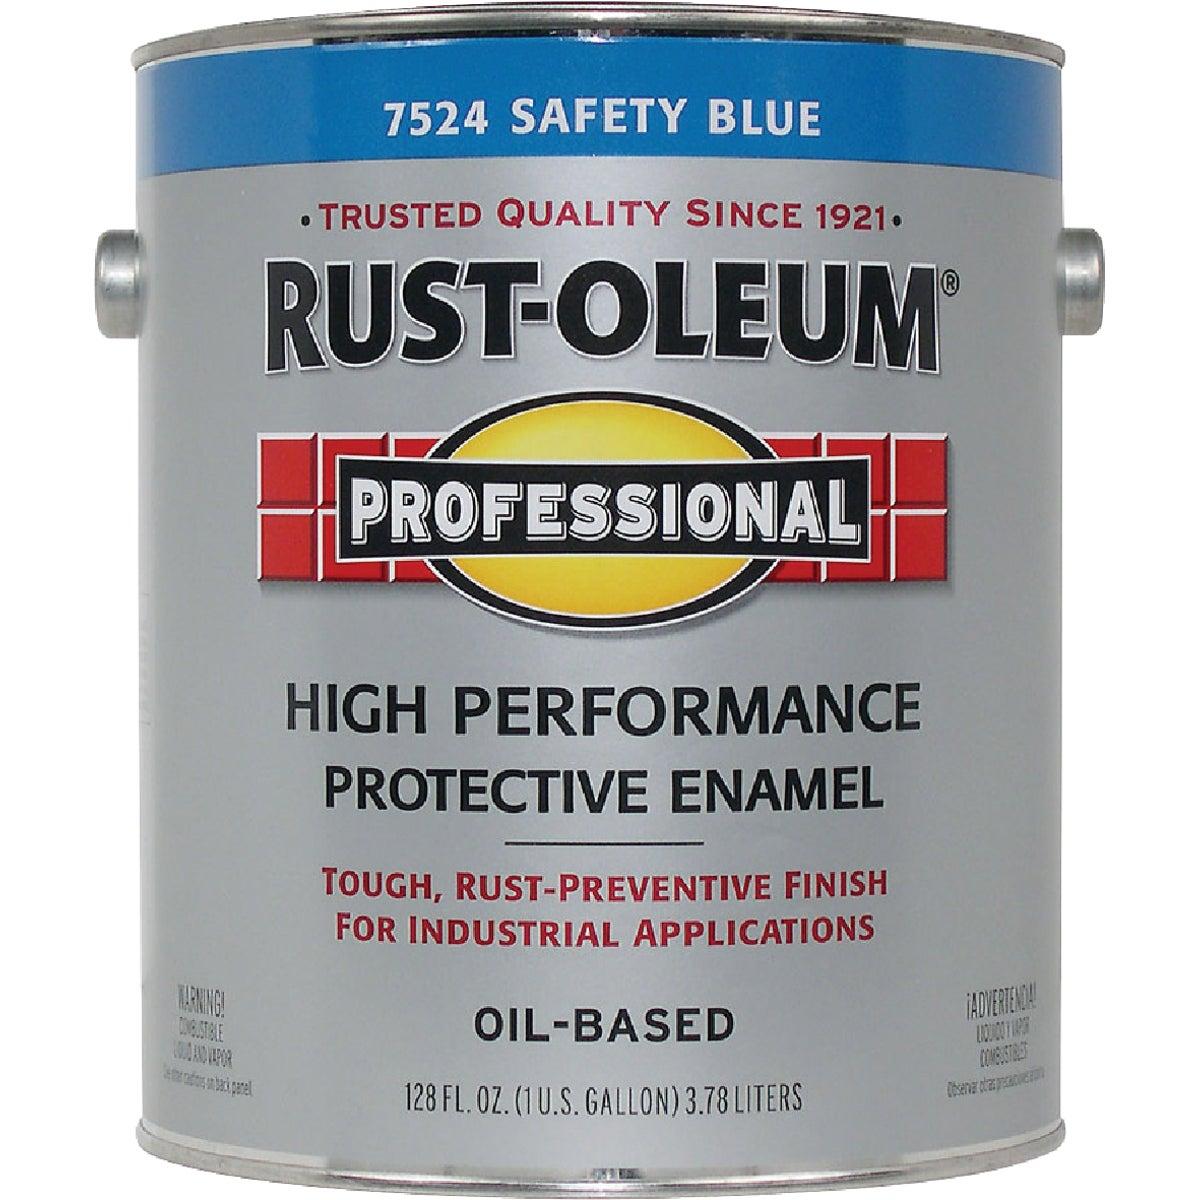 SAFETY BLUE PRO ENAMEL